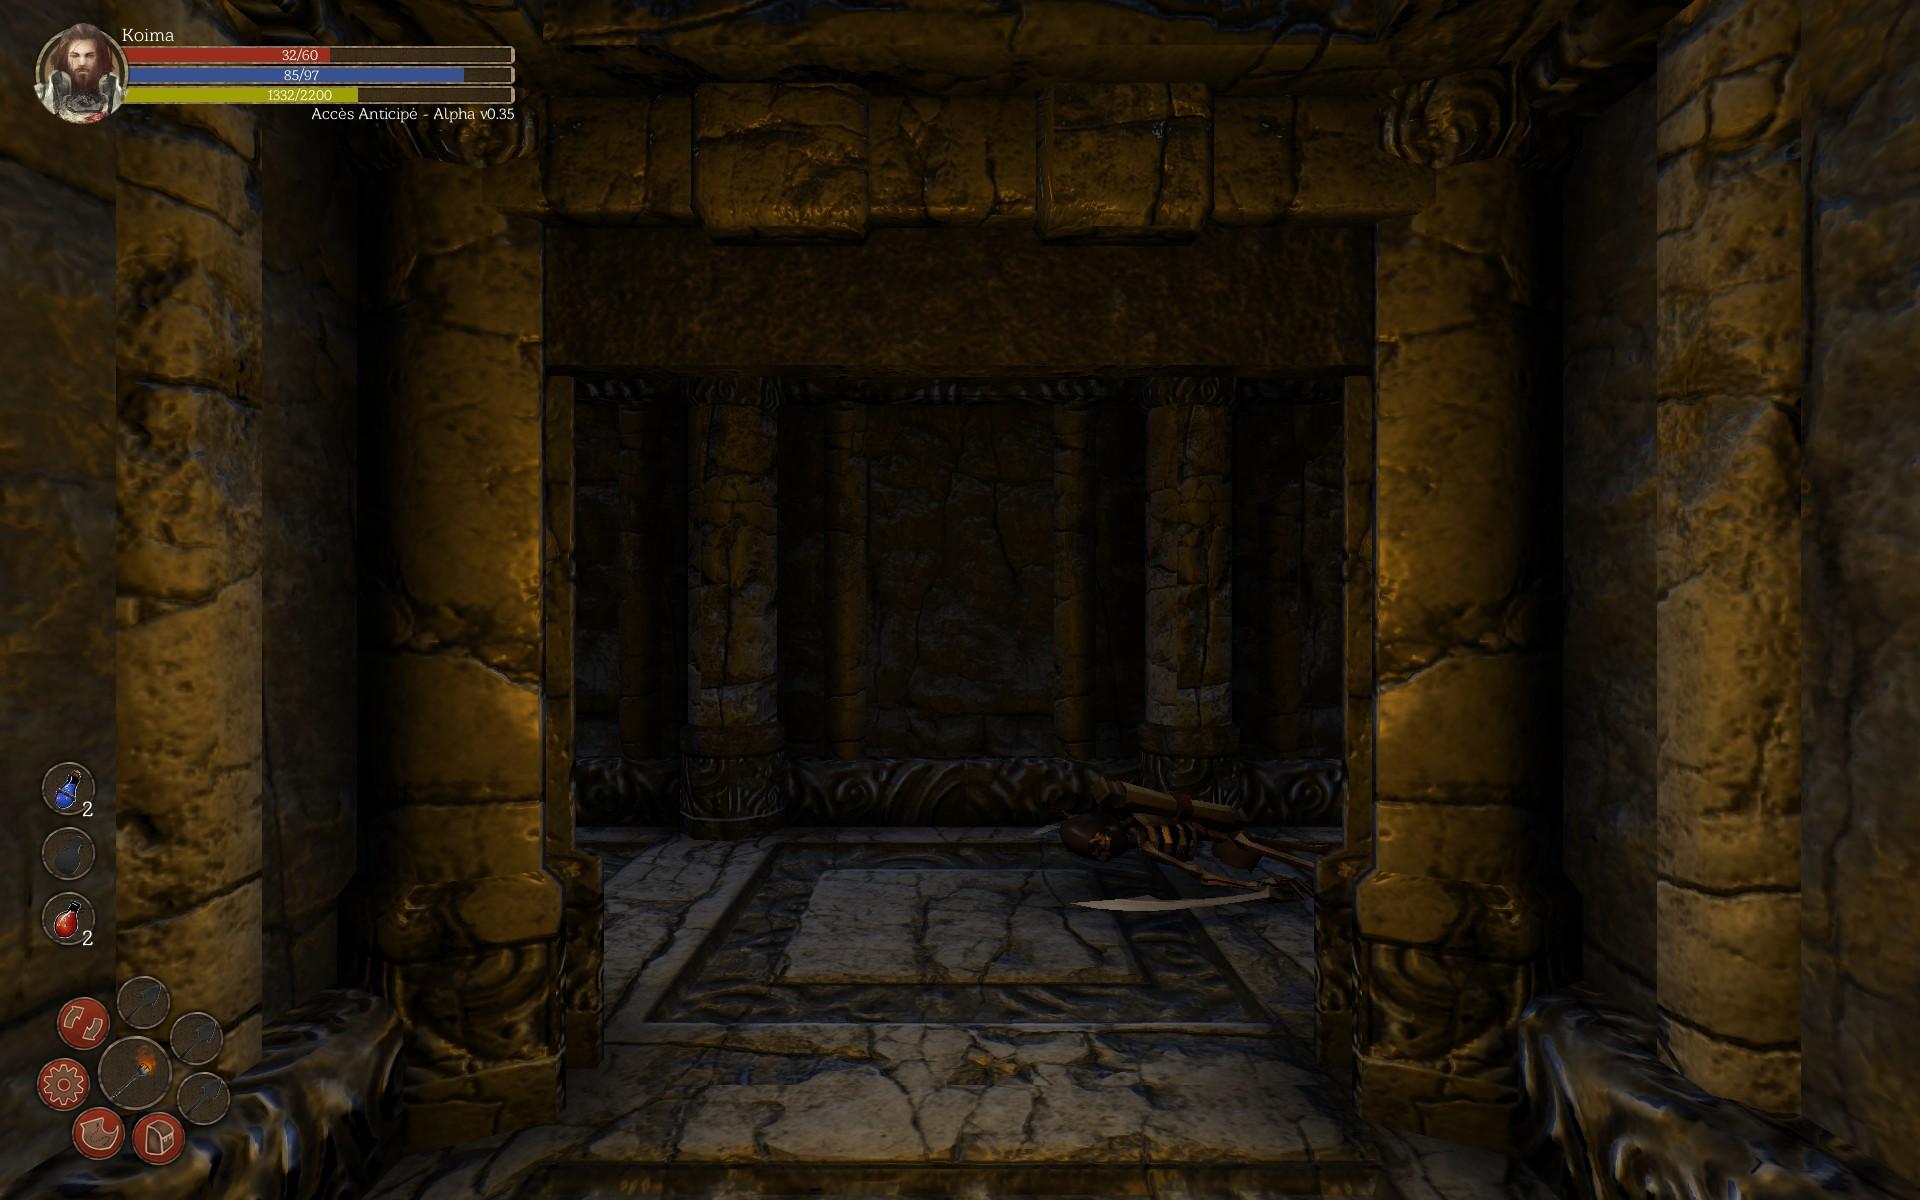 RPG old school : Dungeon Master, Eye Of Beholder, Grimrock.. - Page 4 2365672015090300002